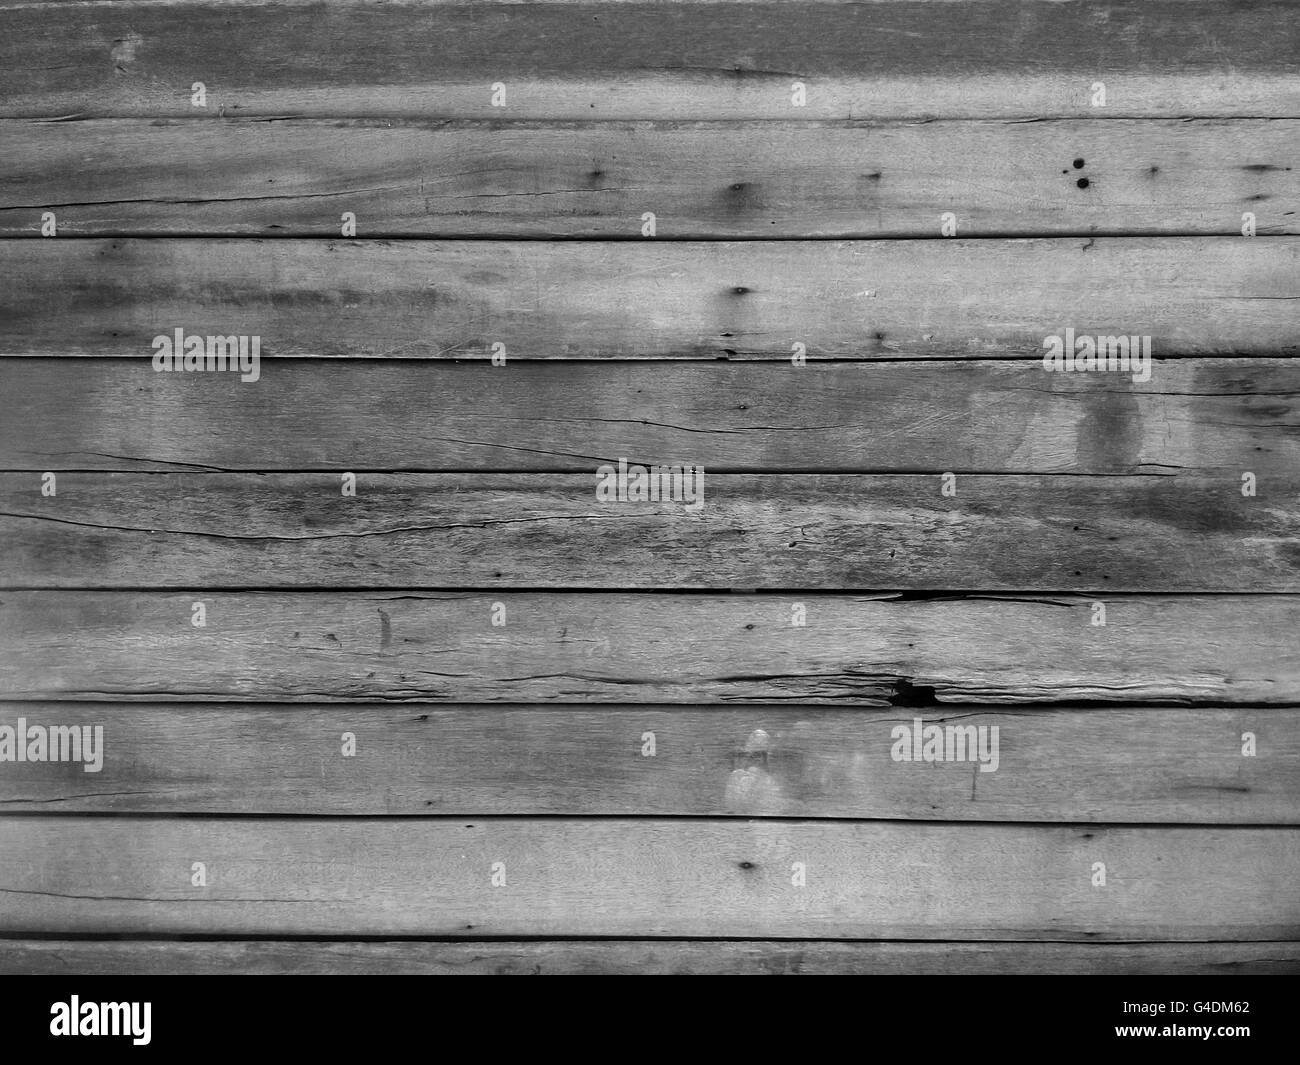 Wooden floors, wooden planks for background. - Stock Image